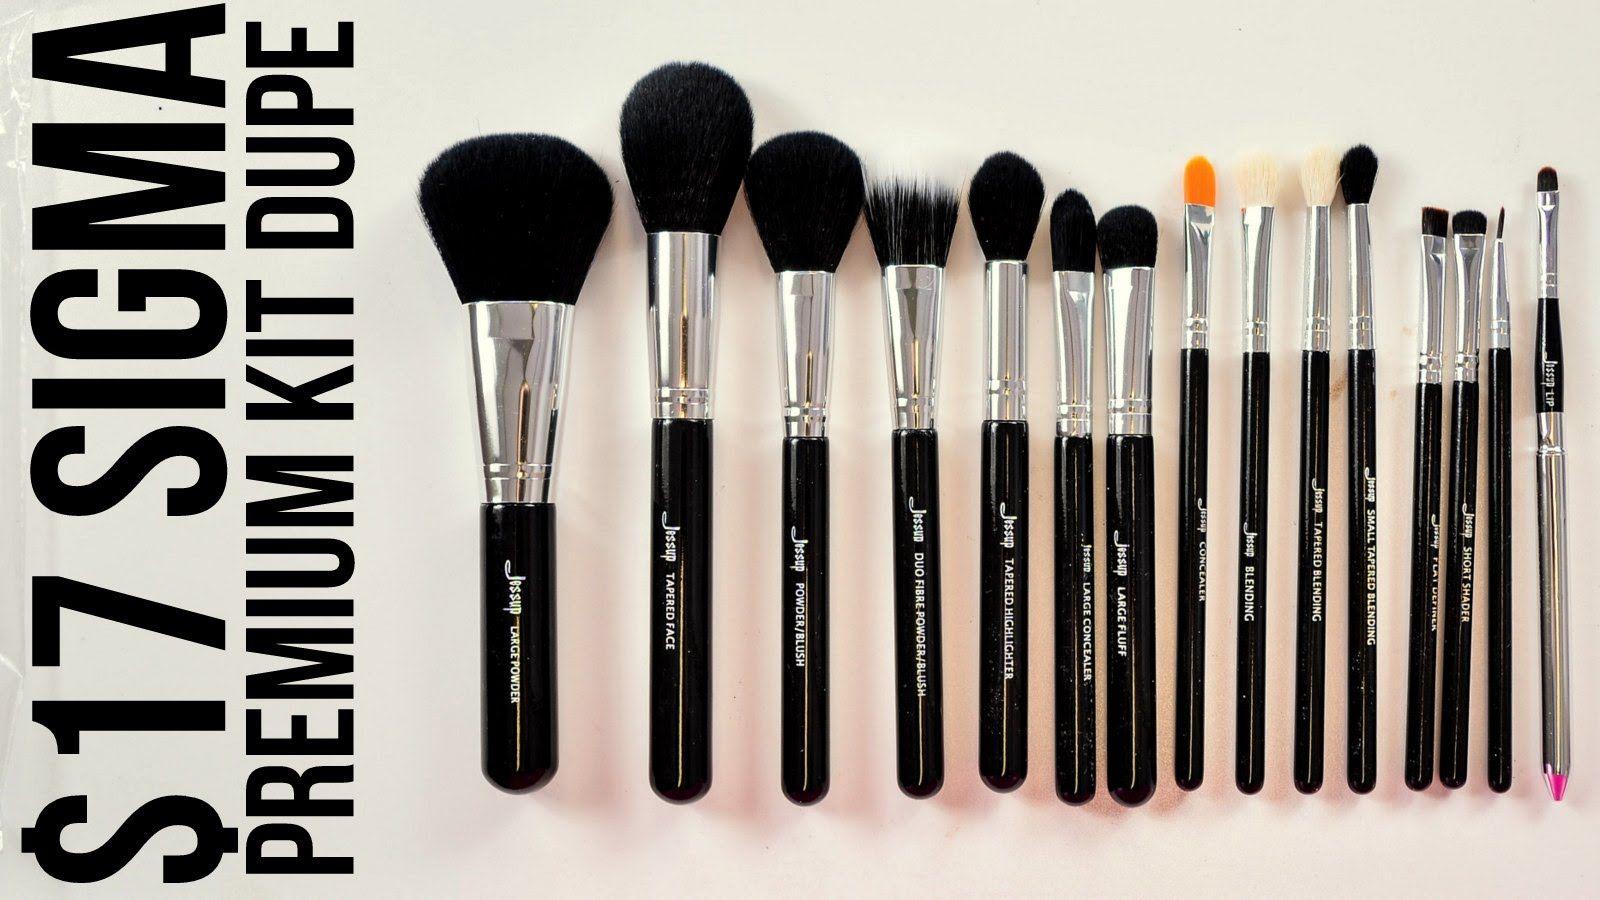 17 SIGMA PREMIUM KIT DUPE!!!! Makeup brush dupes